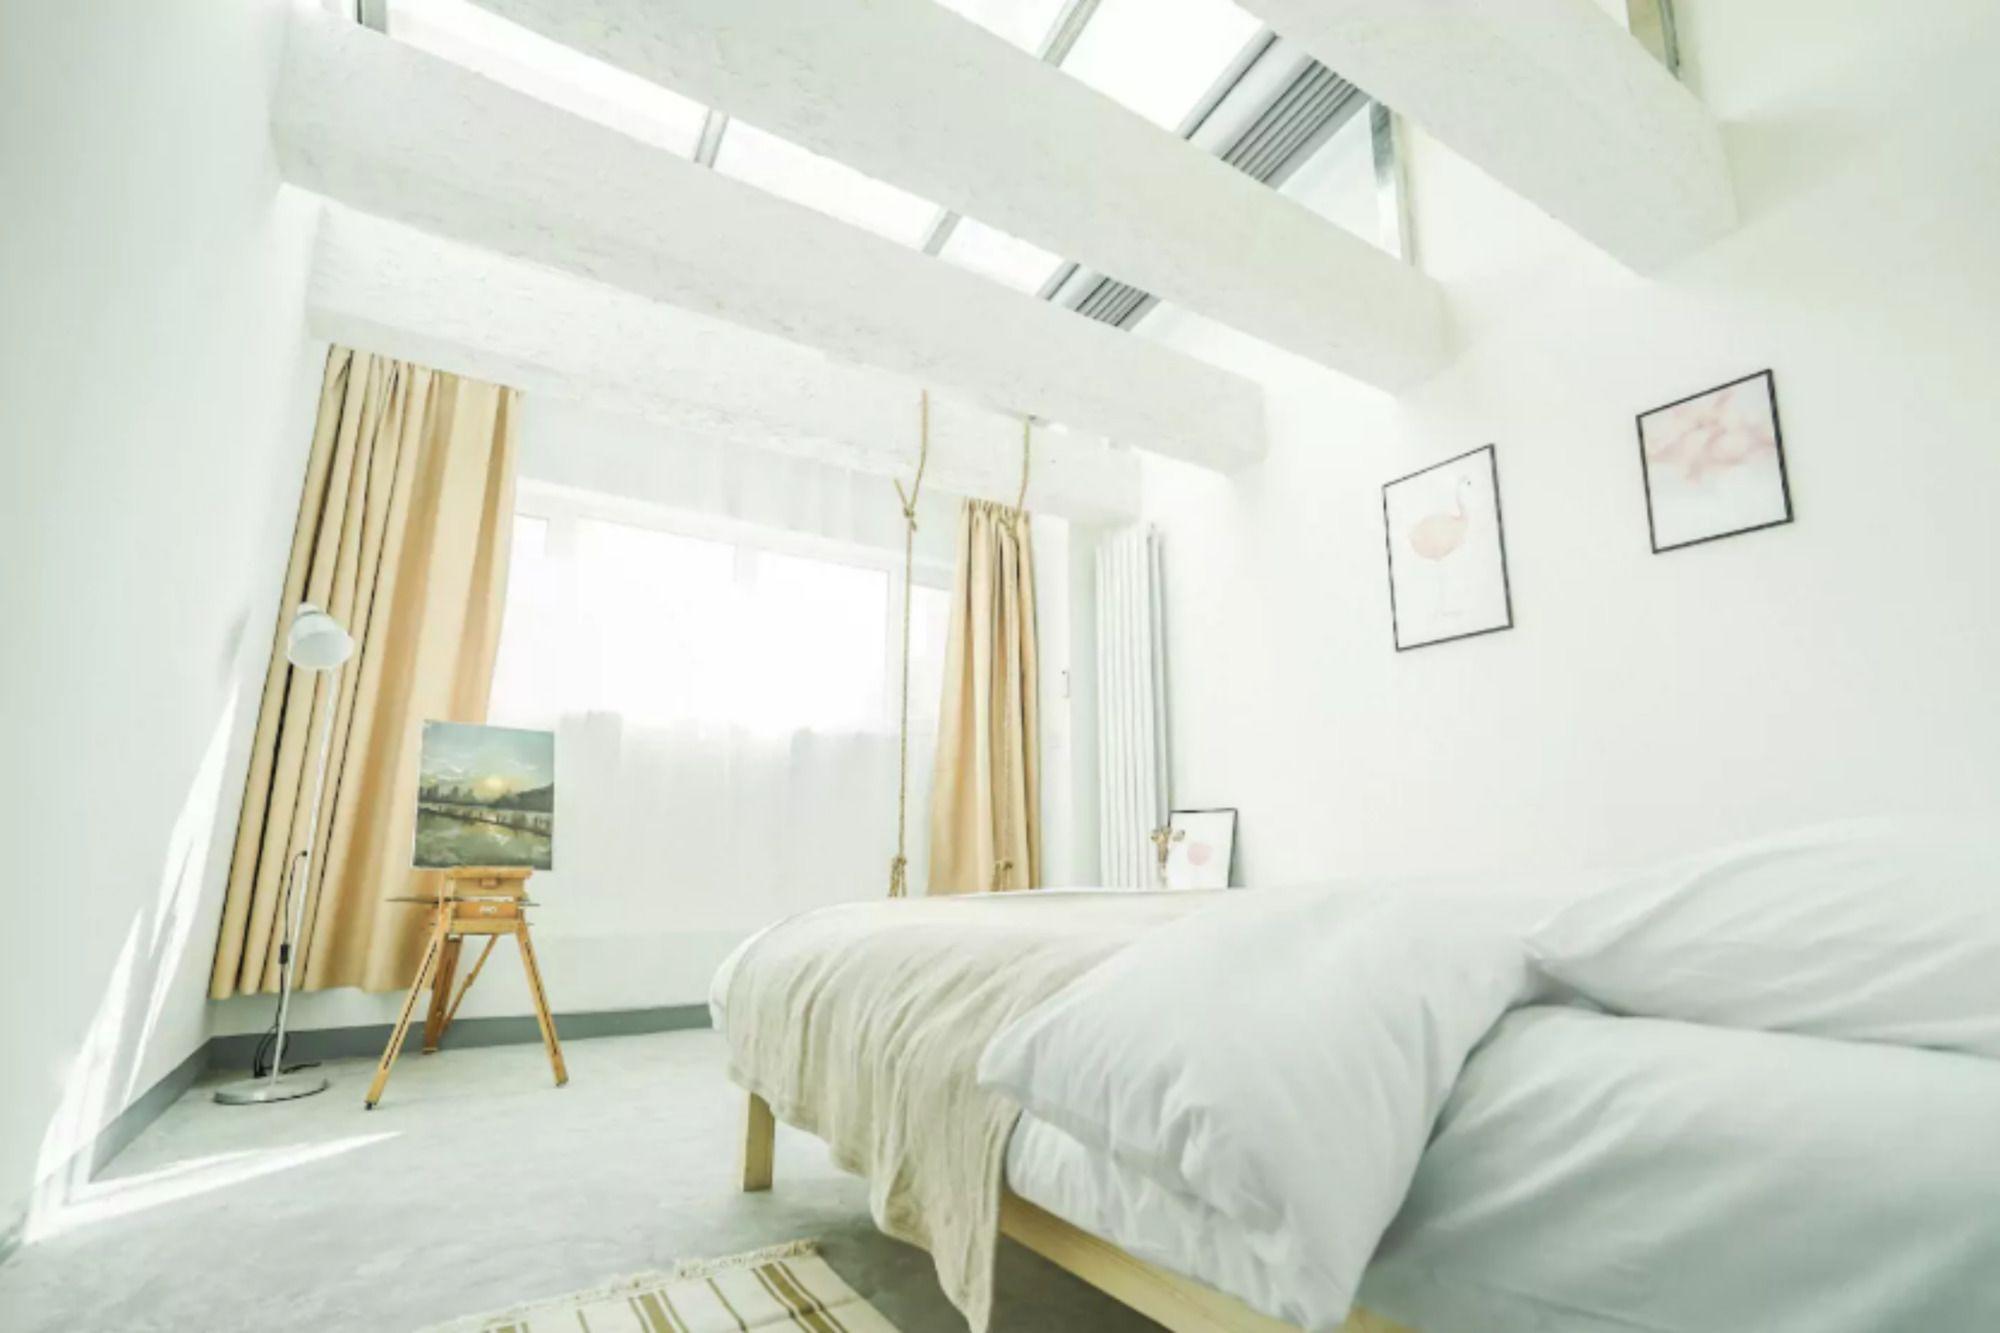 Xi'an Art Homestay No.3